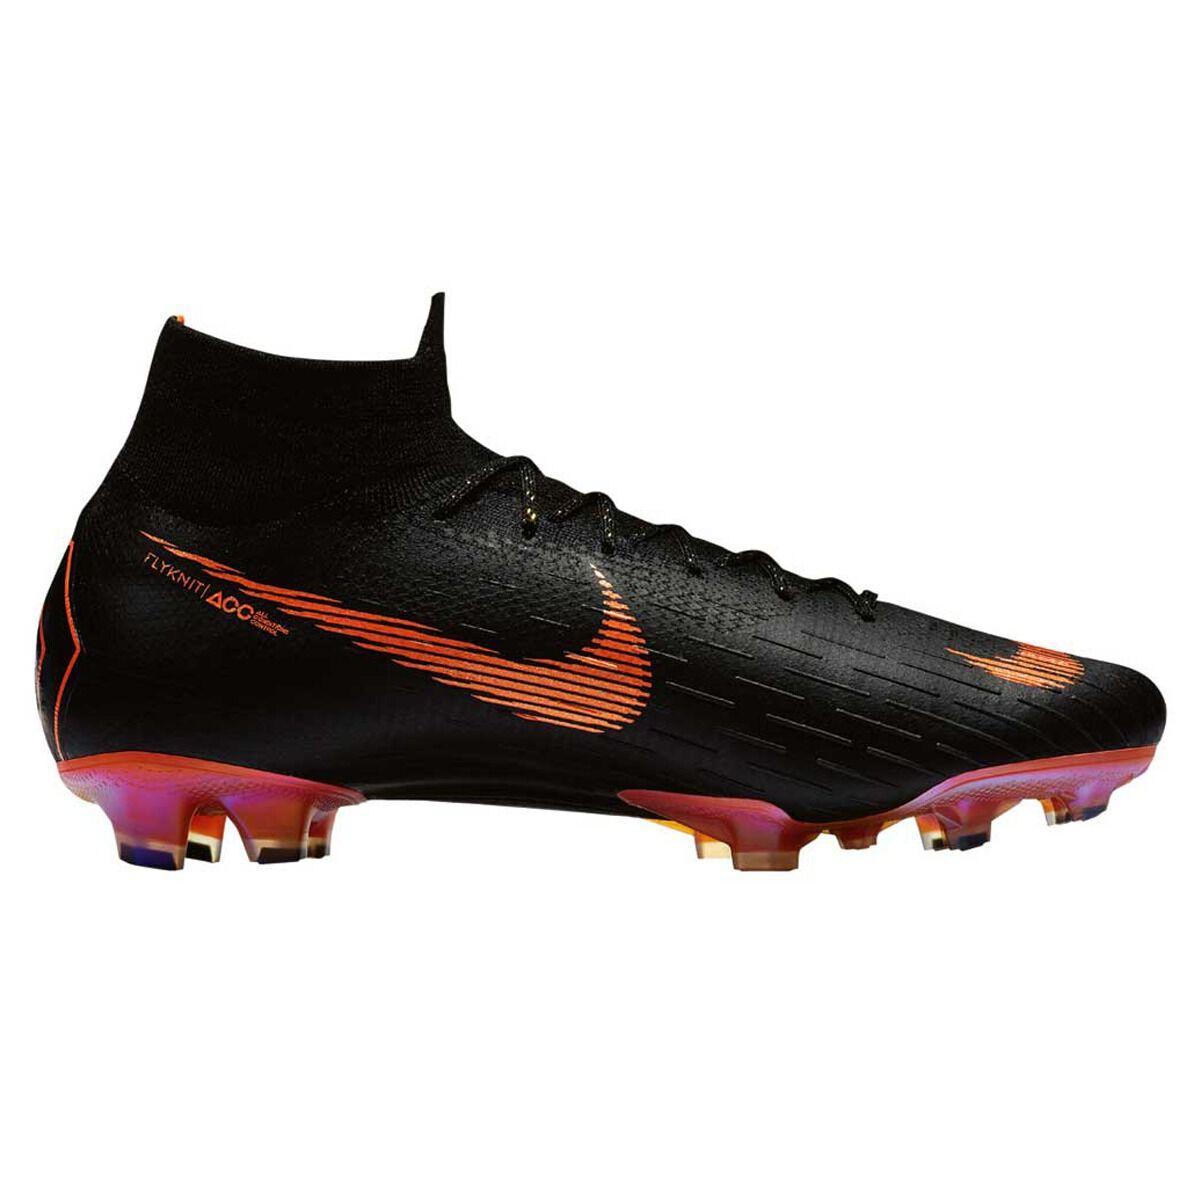 55c97bad181c1 ... cheap nike mercurial superfly vi elite mens football boots black orange  us 7 adult black 79edb